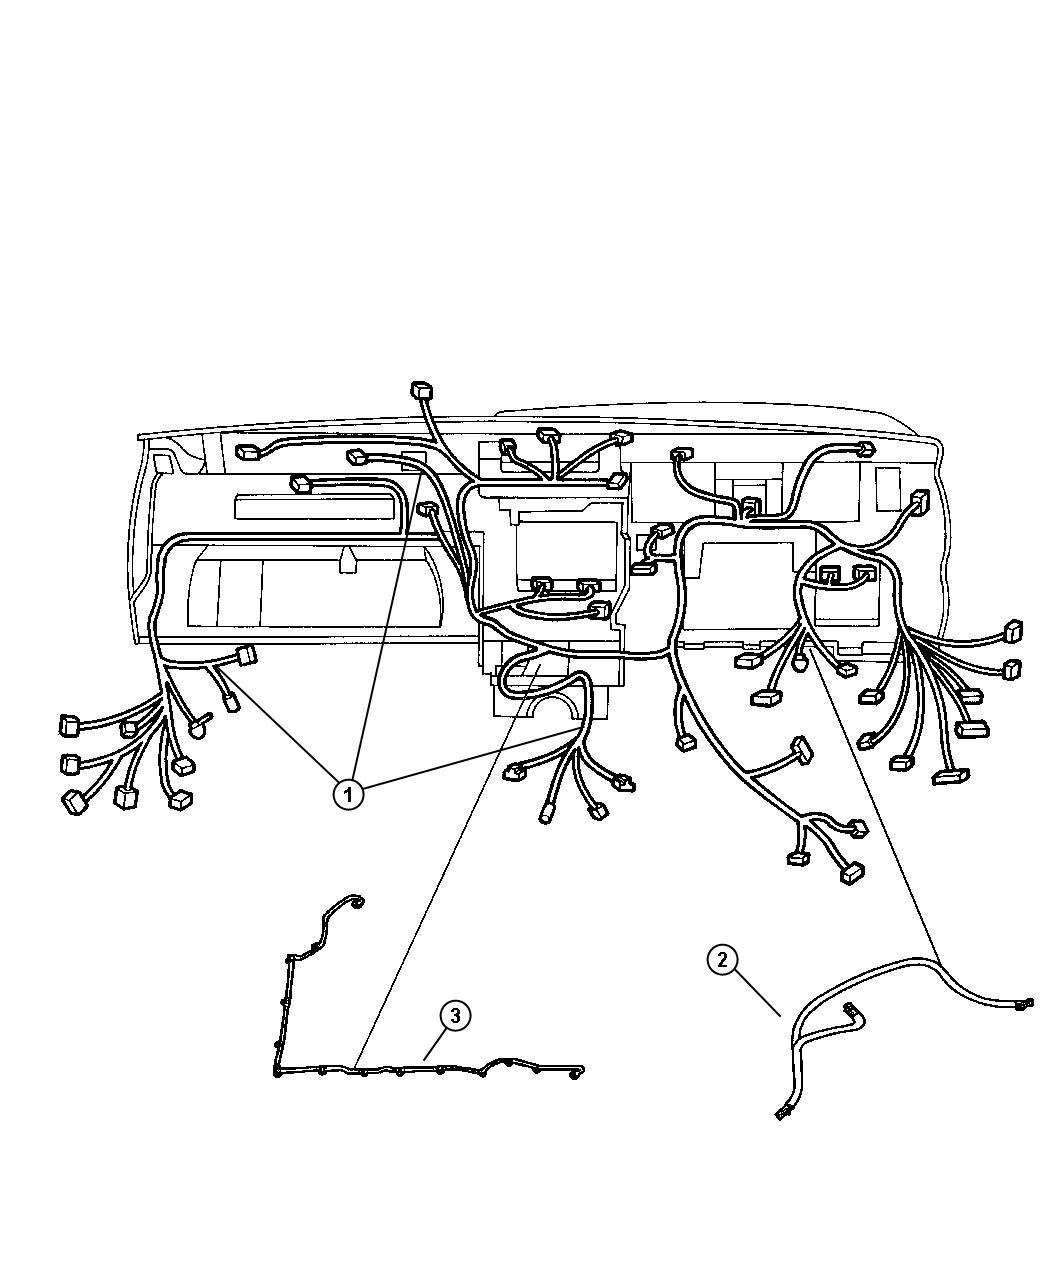 Jeep Commander Wiring. Instrument panel. [6 speakers] up